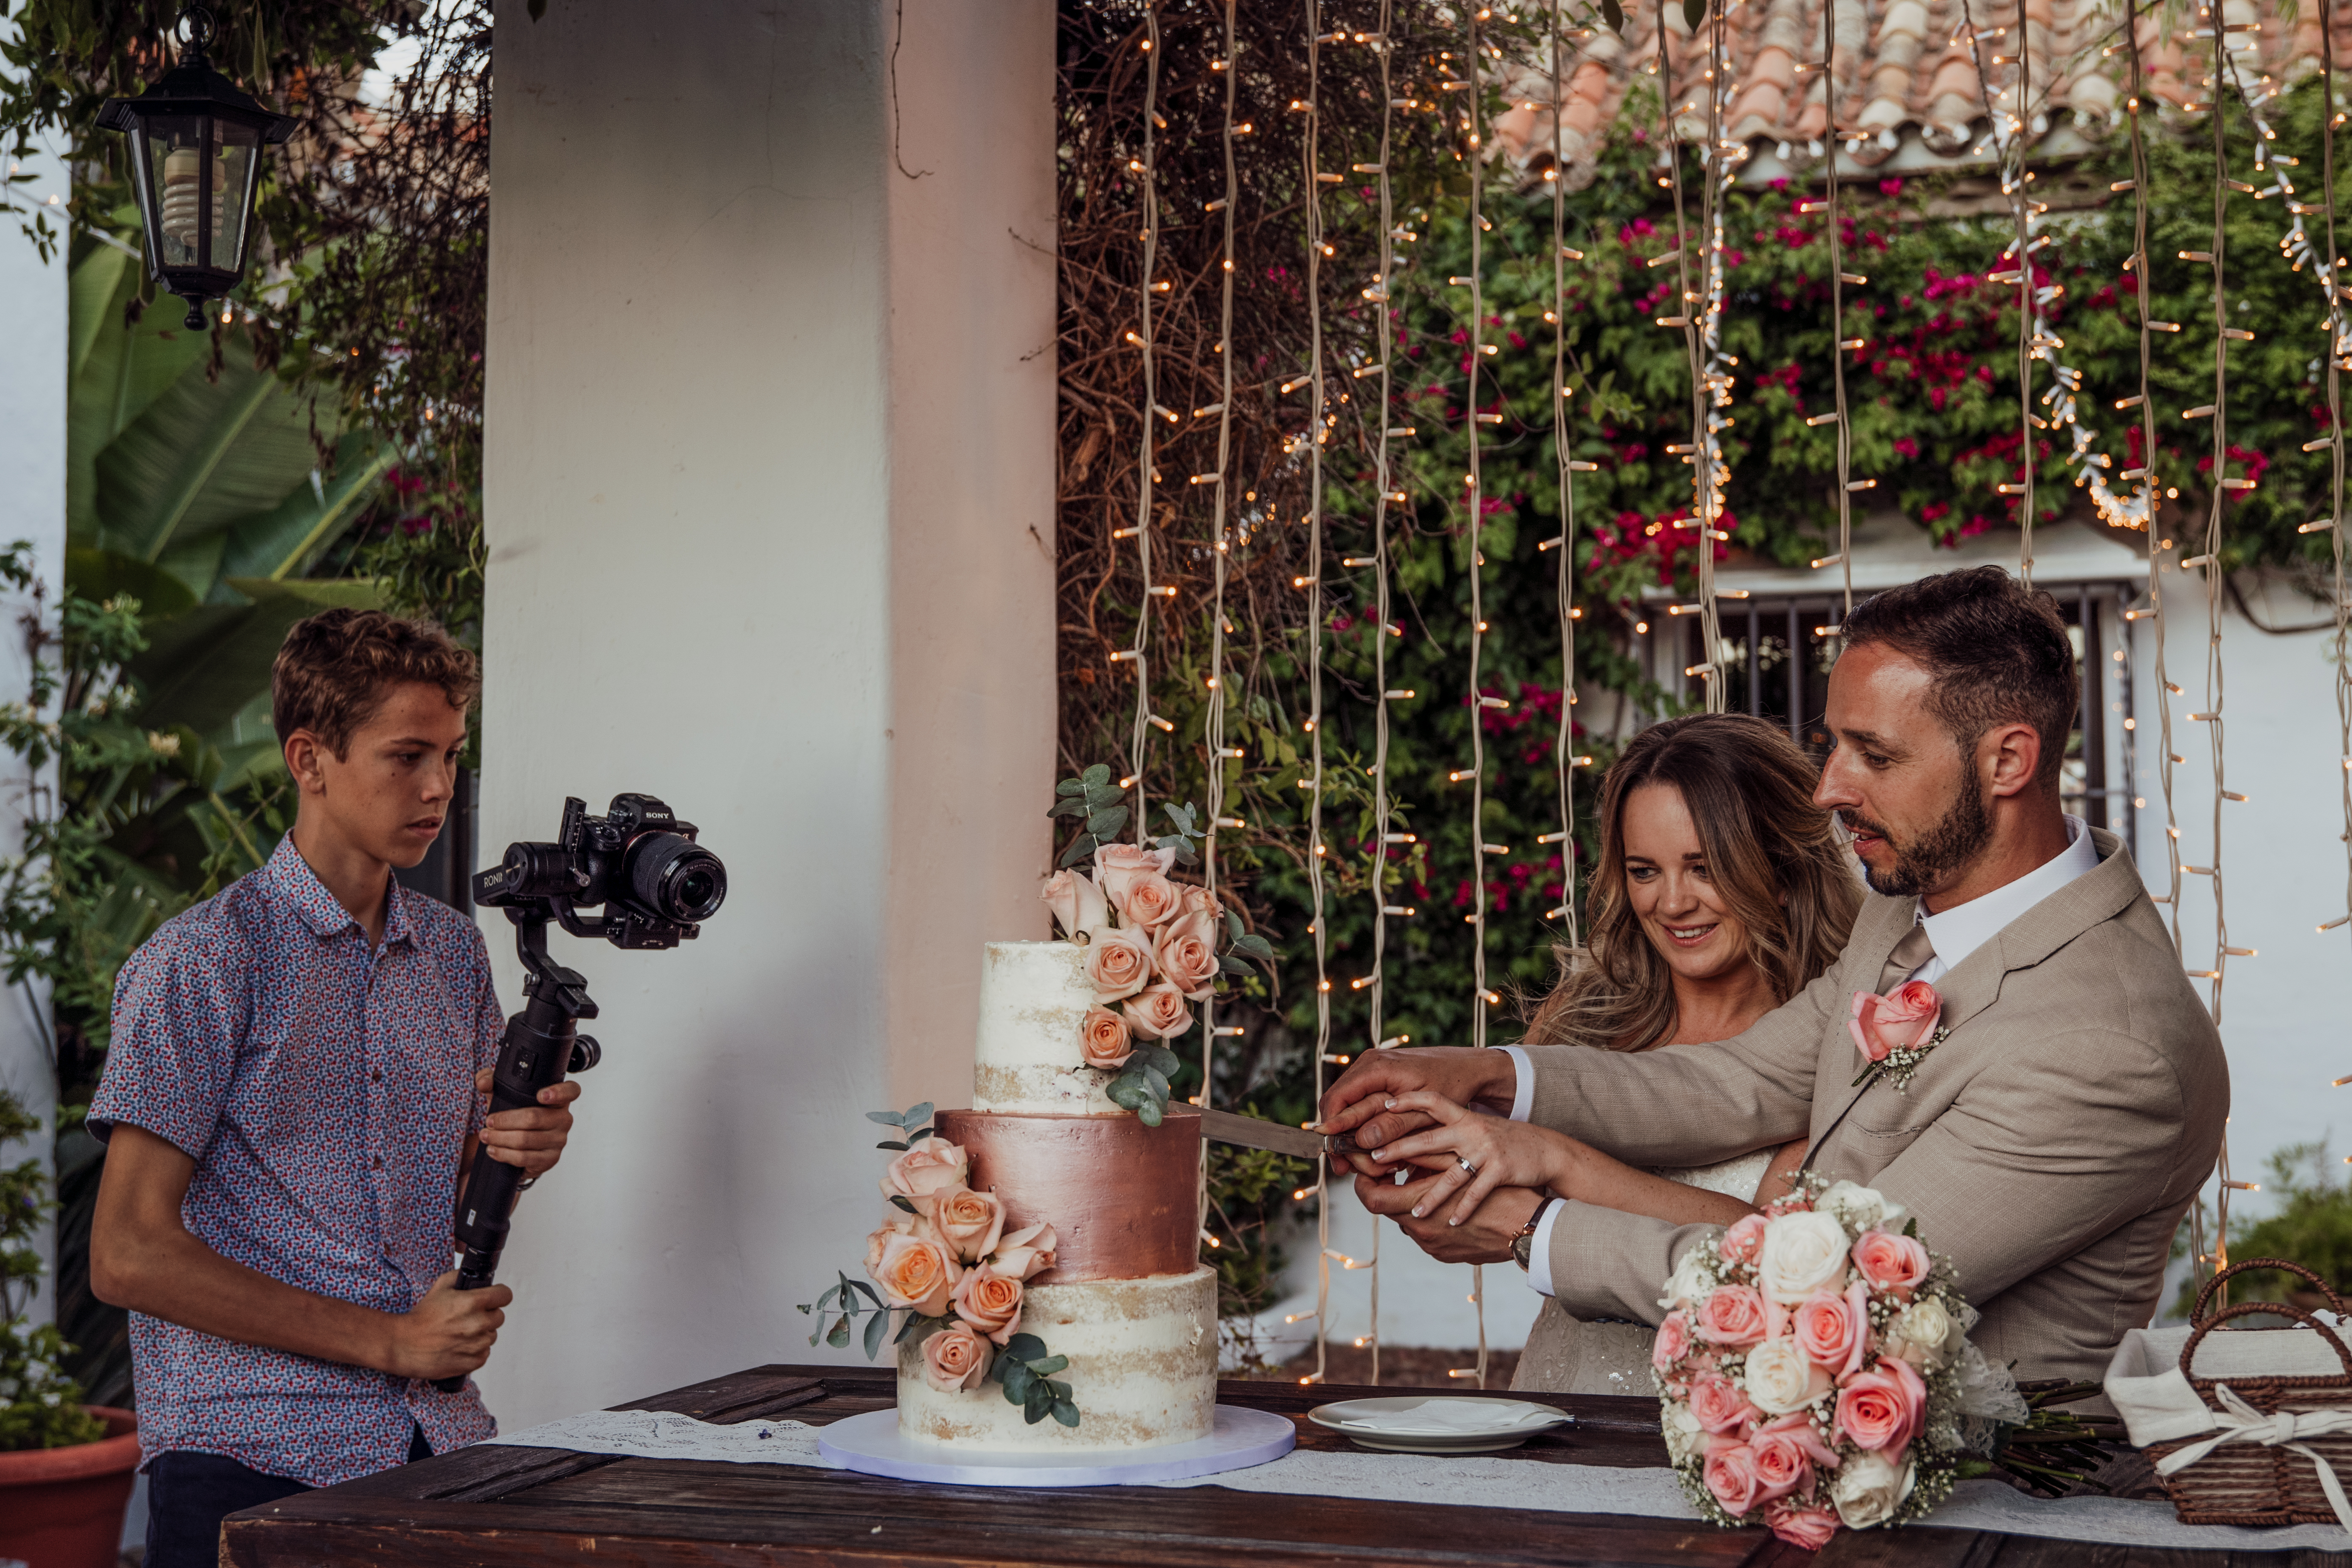 Cut The Cake Capture